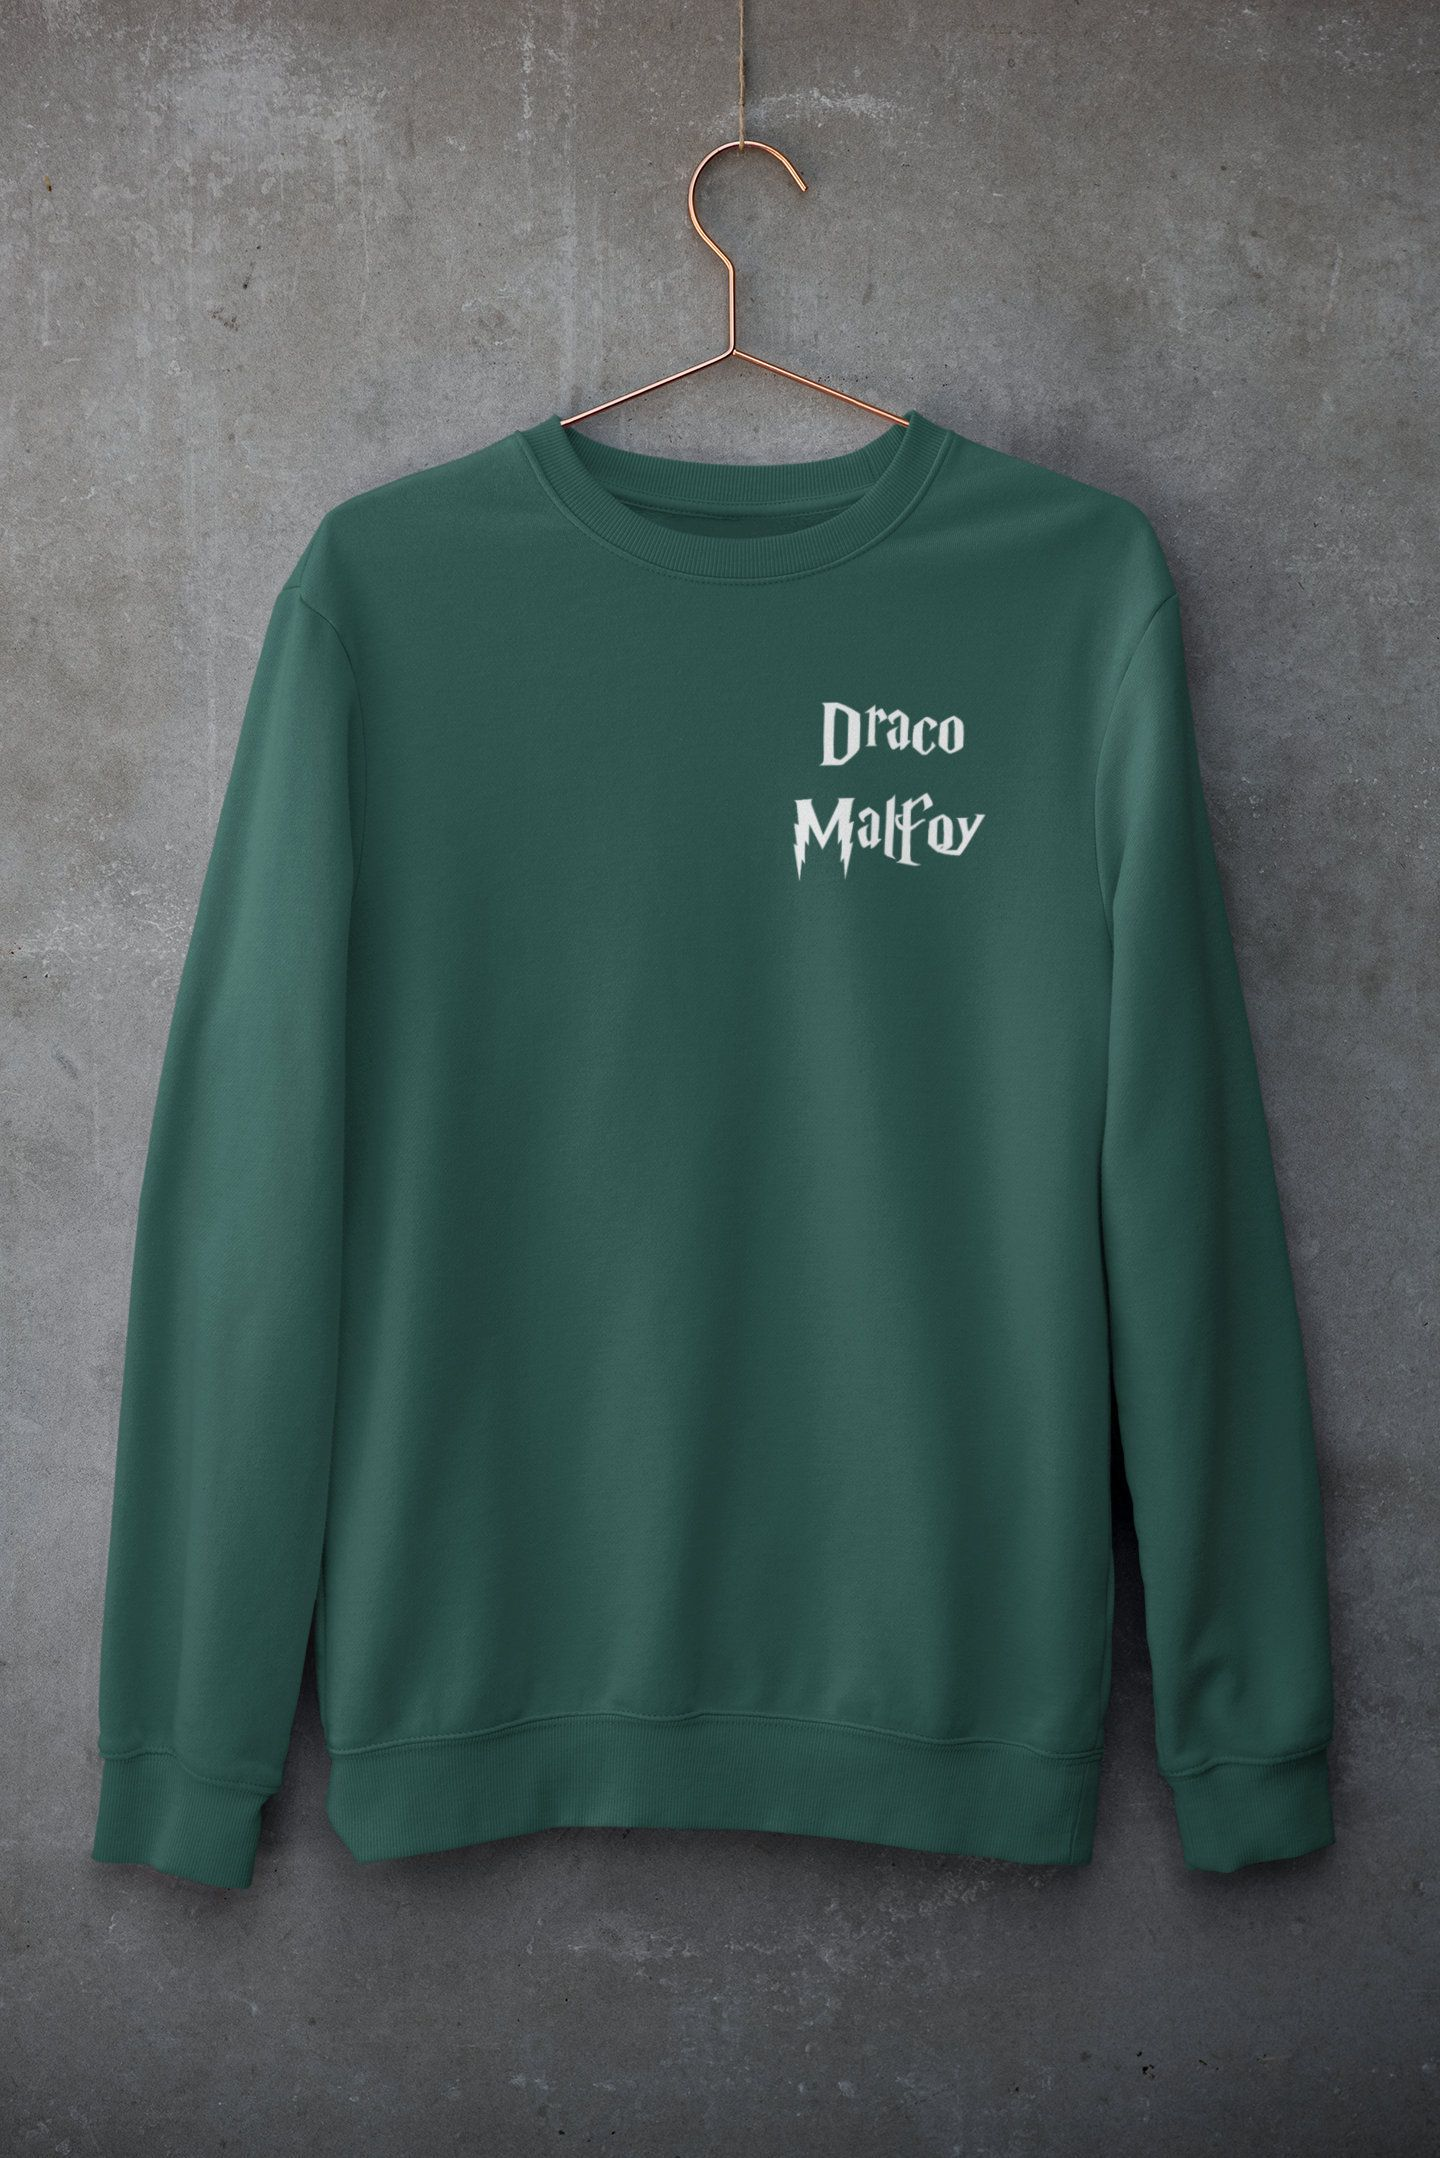 Draco Malfoy Sweatshirt Slytherin Sweatshirt Unisex Heavy Blend Crewneck Sweatshirt Movie Marathon Sweate Sweatshirts Harry Potter Outfits Harry Potter Sweater [ 2158 x 1440 Pixel ]